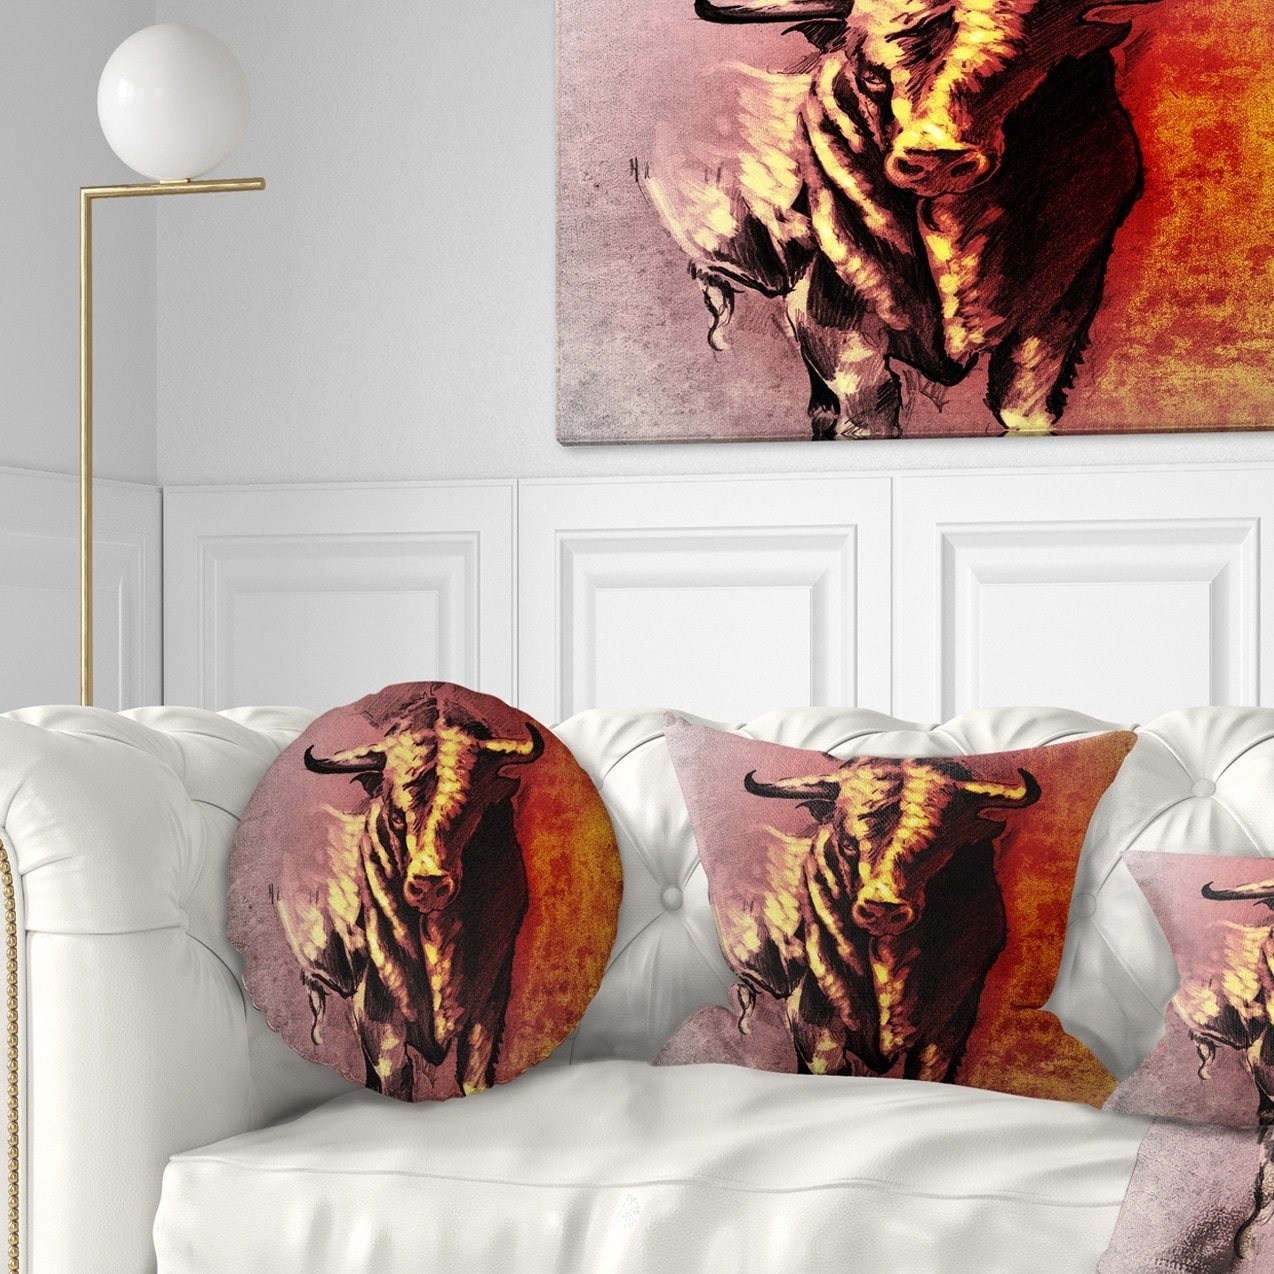 Designart CU7818-18-18 Spanish Bull Tattoo Sketch Abstract Throw Pillow 18 x 18